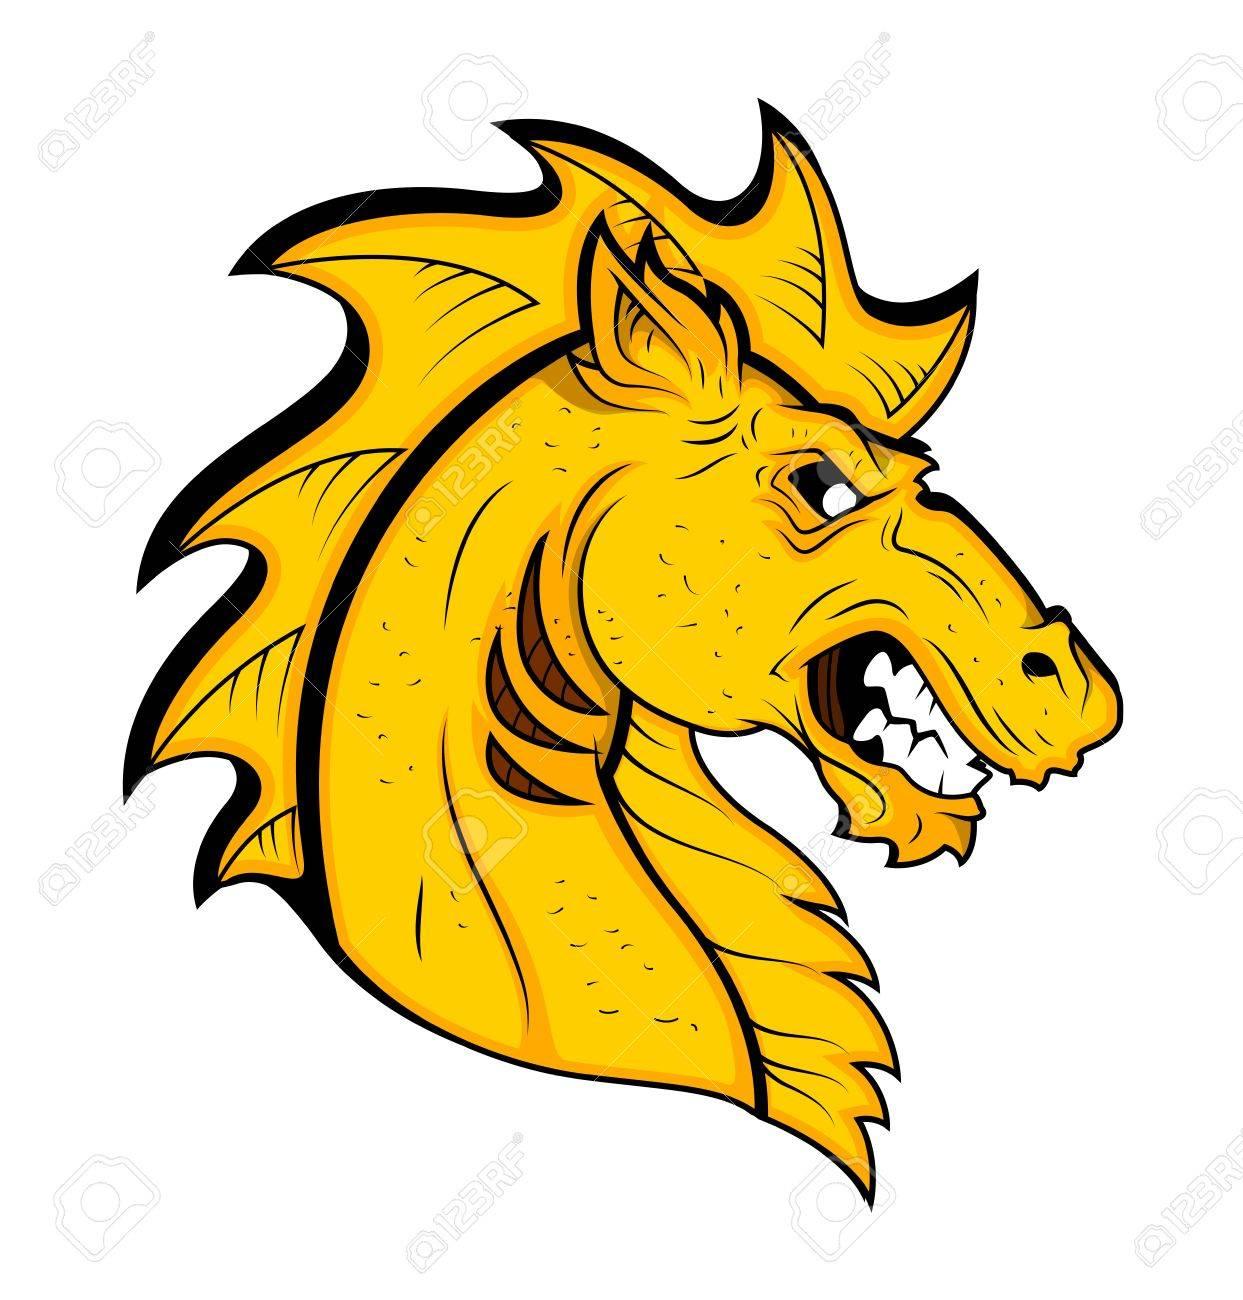 Free Mustang Mascot Cliparts, Download Free Clip Art, Free Clip Art on  Clipart Library